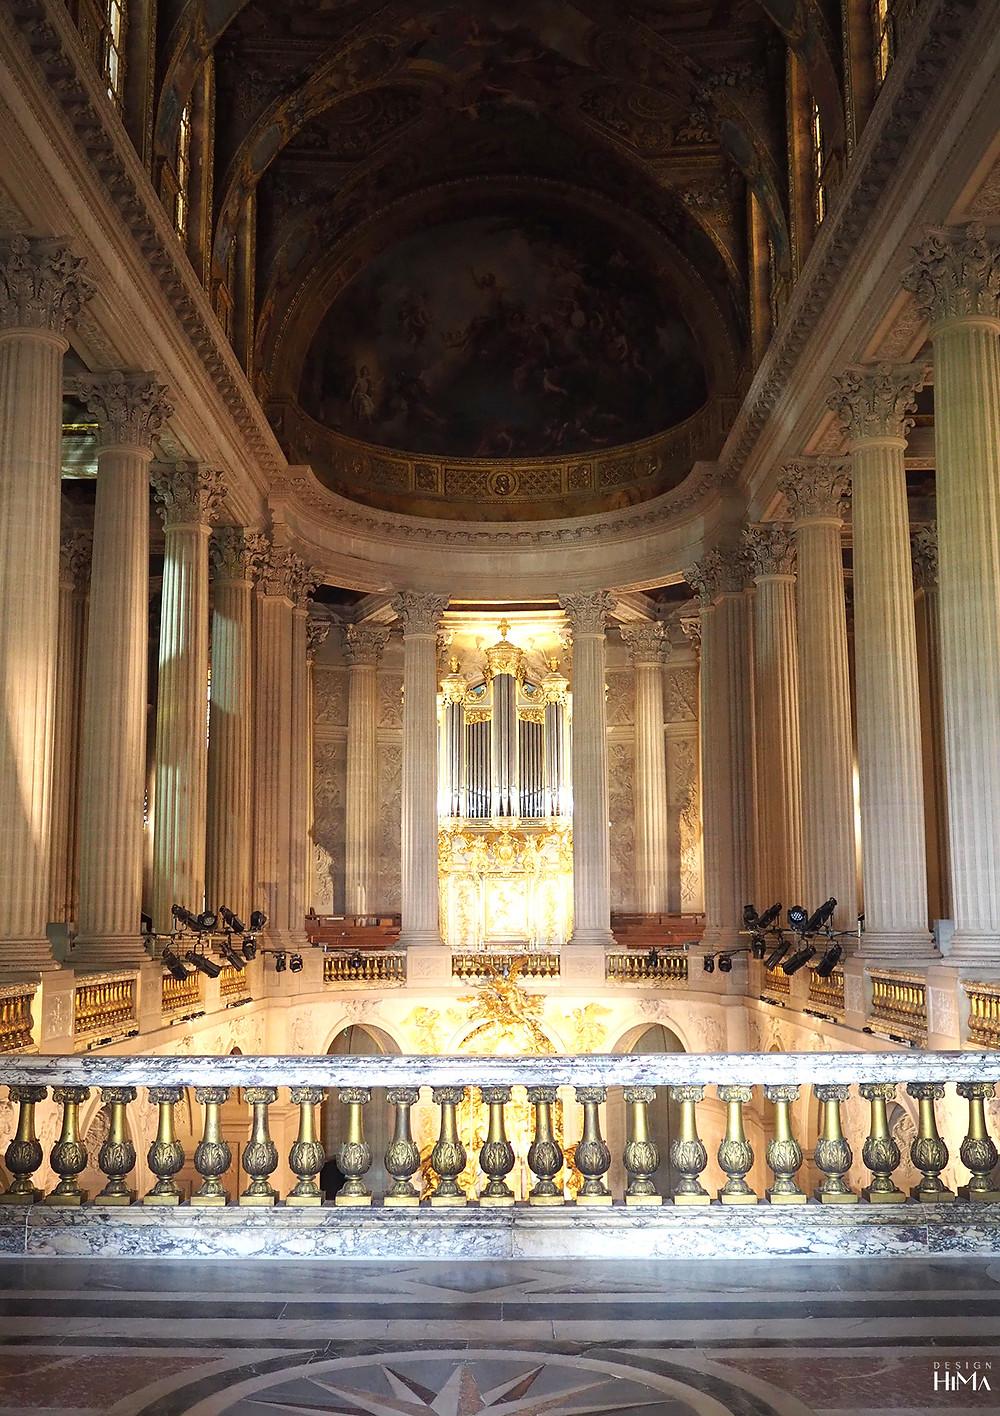 Versaillesin linnan temppelin ururt